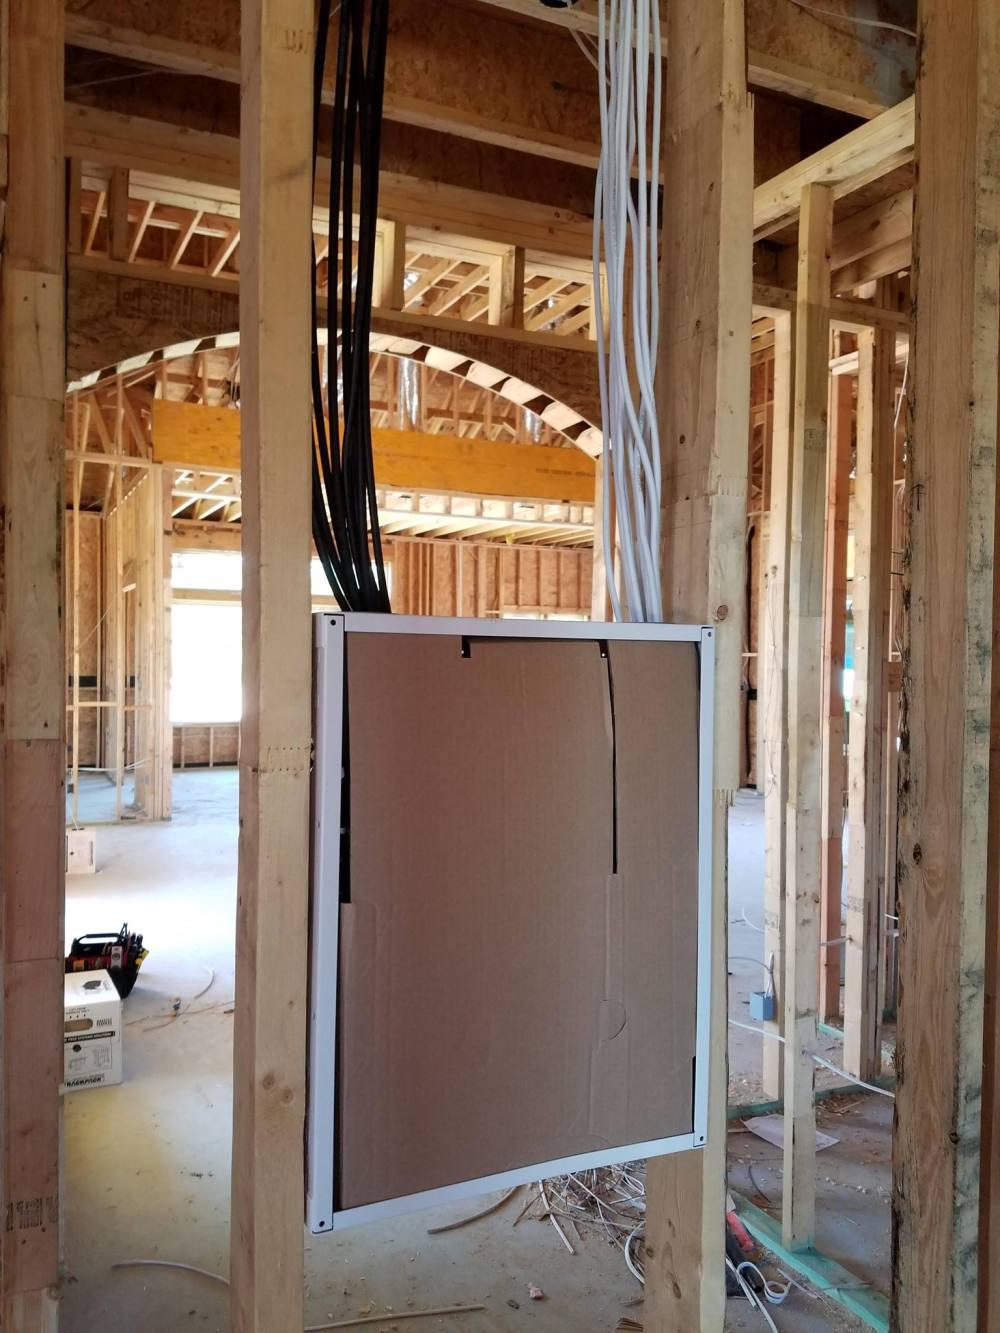 medium resolution of residential commercial prewiring